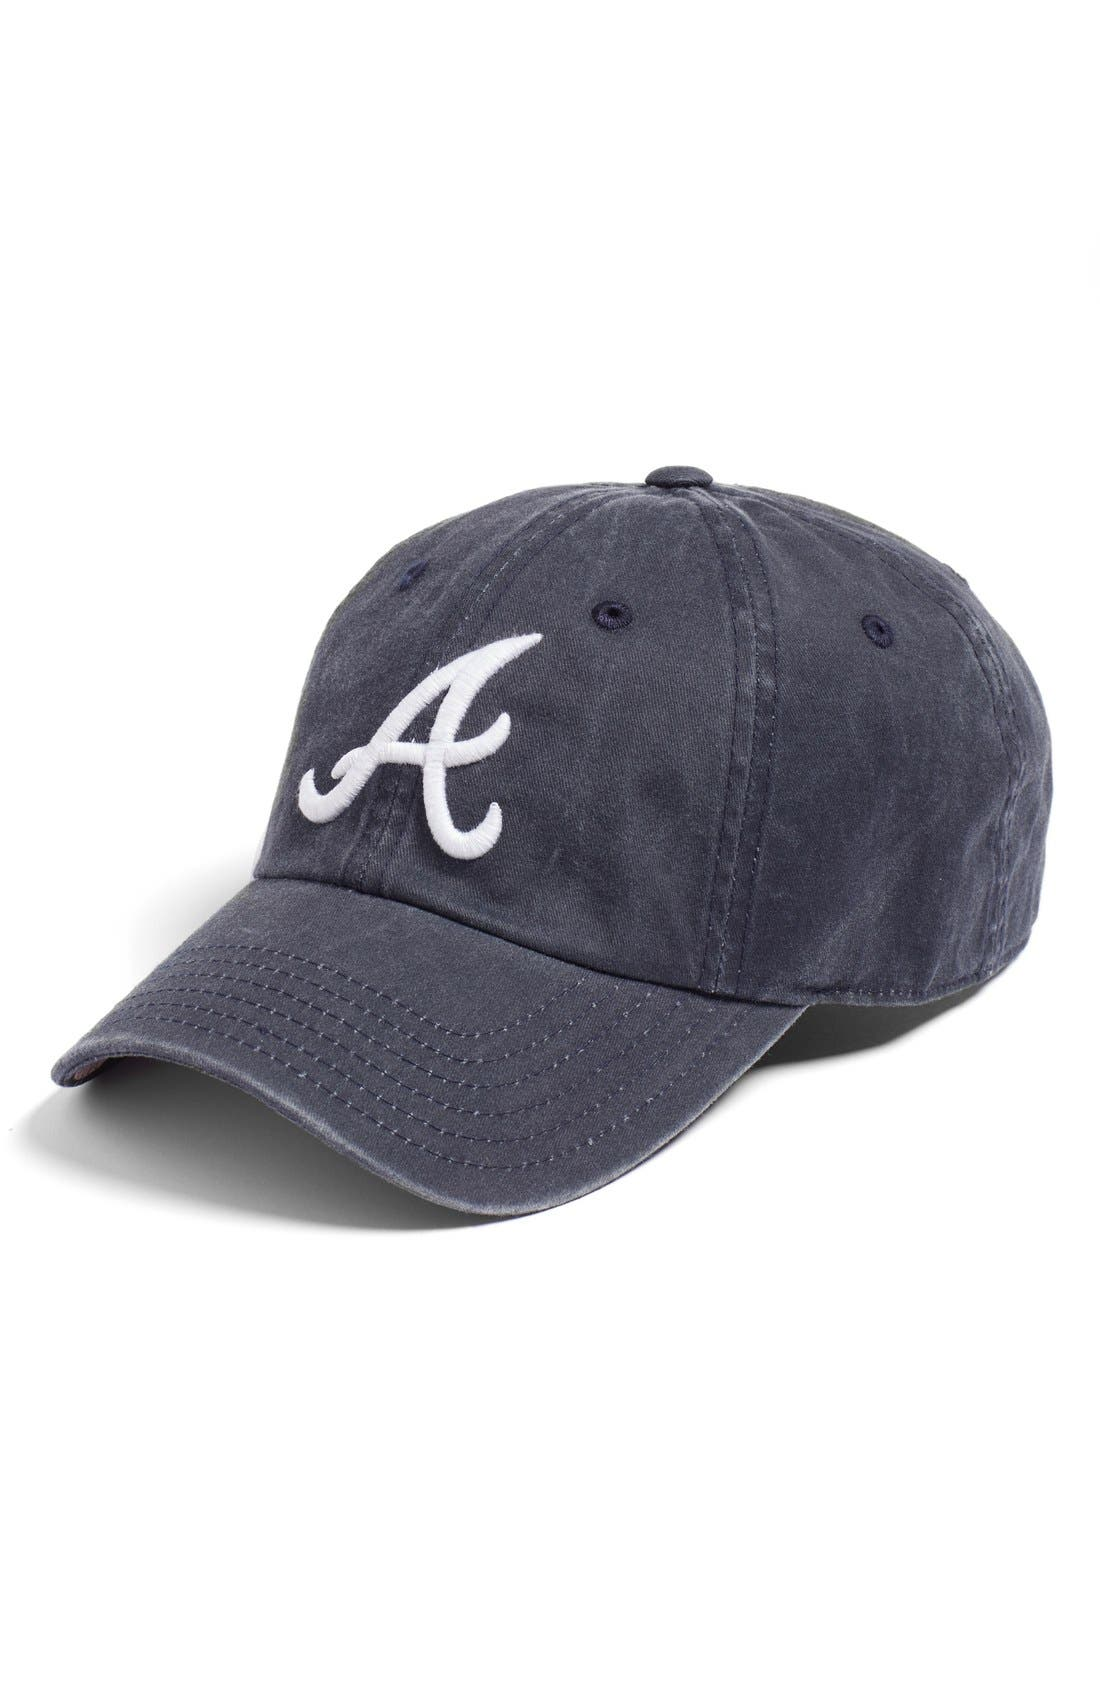 AMERICAN NEEDLE New Raglan - Atlanta Braves Baseball Cap